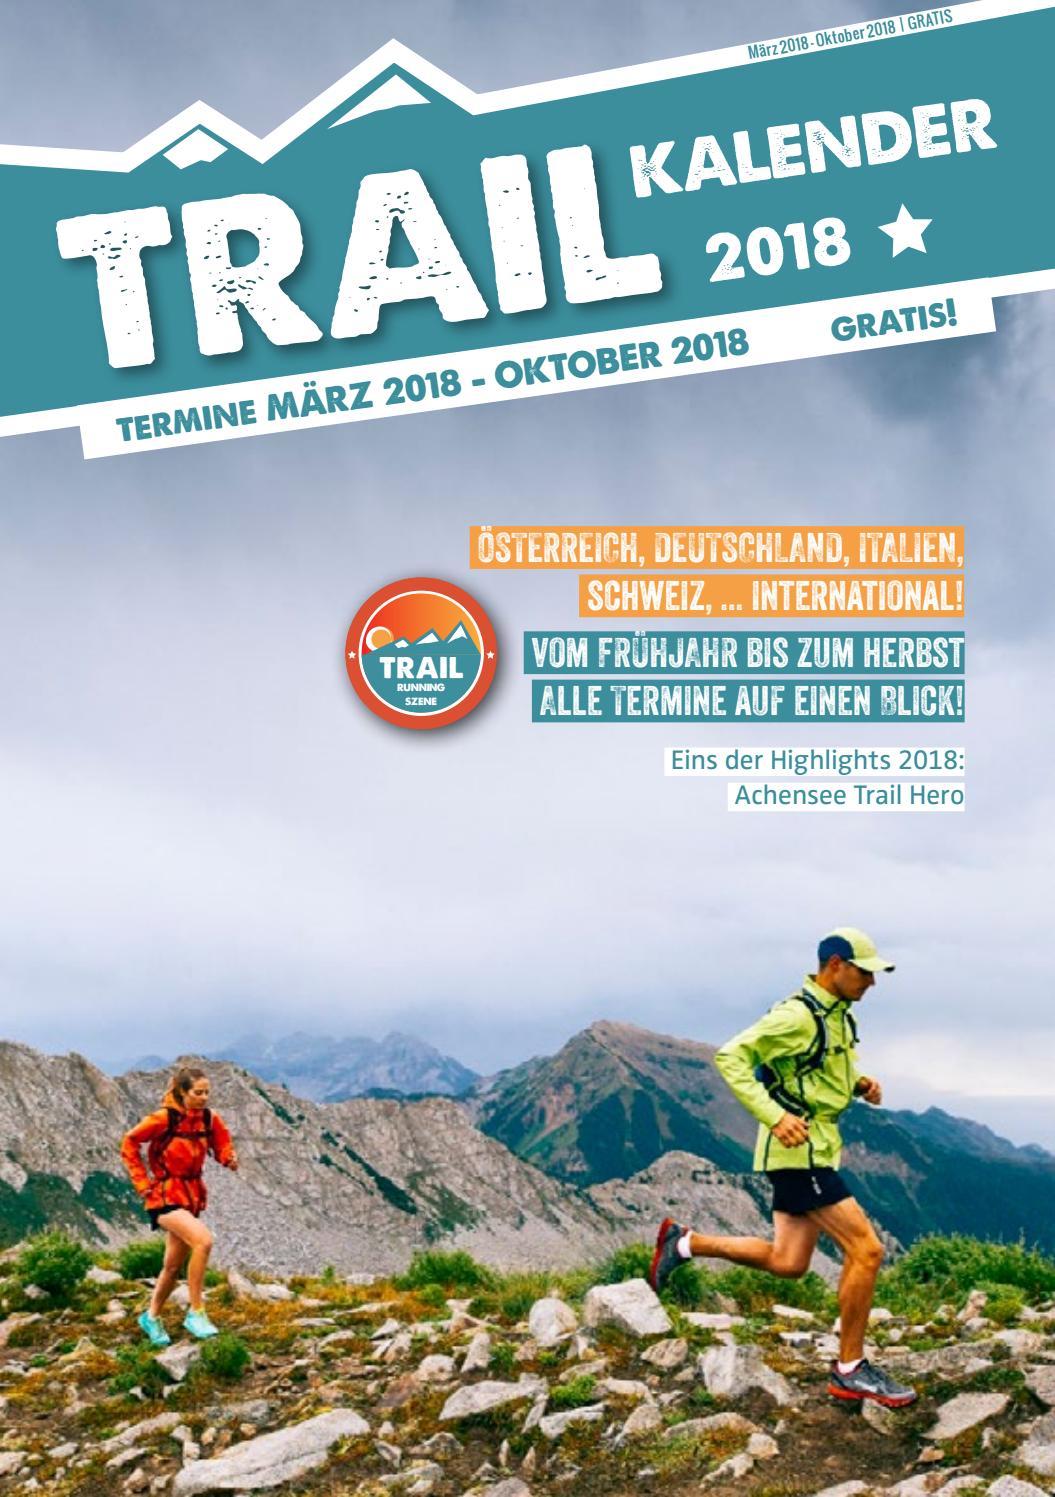 Trail Kalender 2018 by Trailrunning Szene issuu